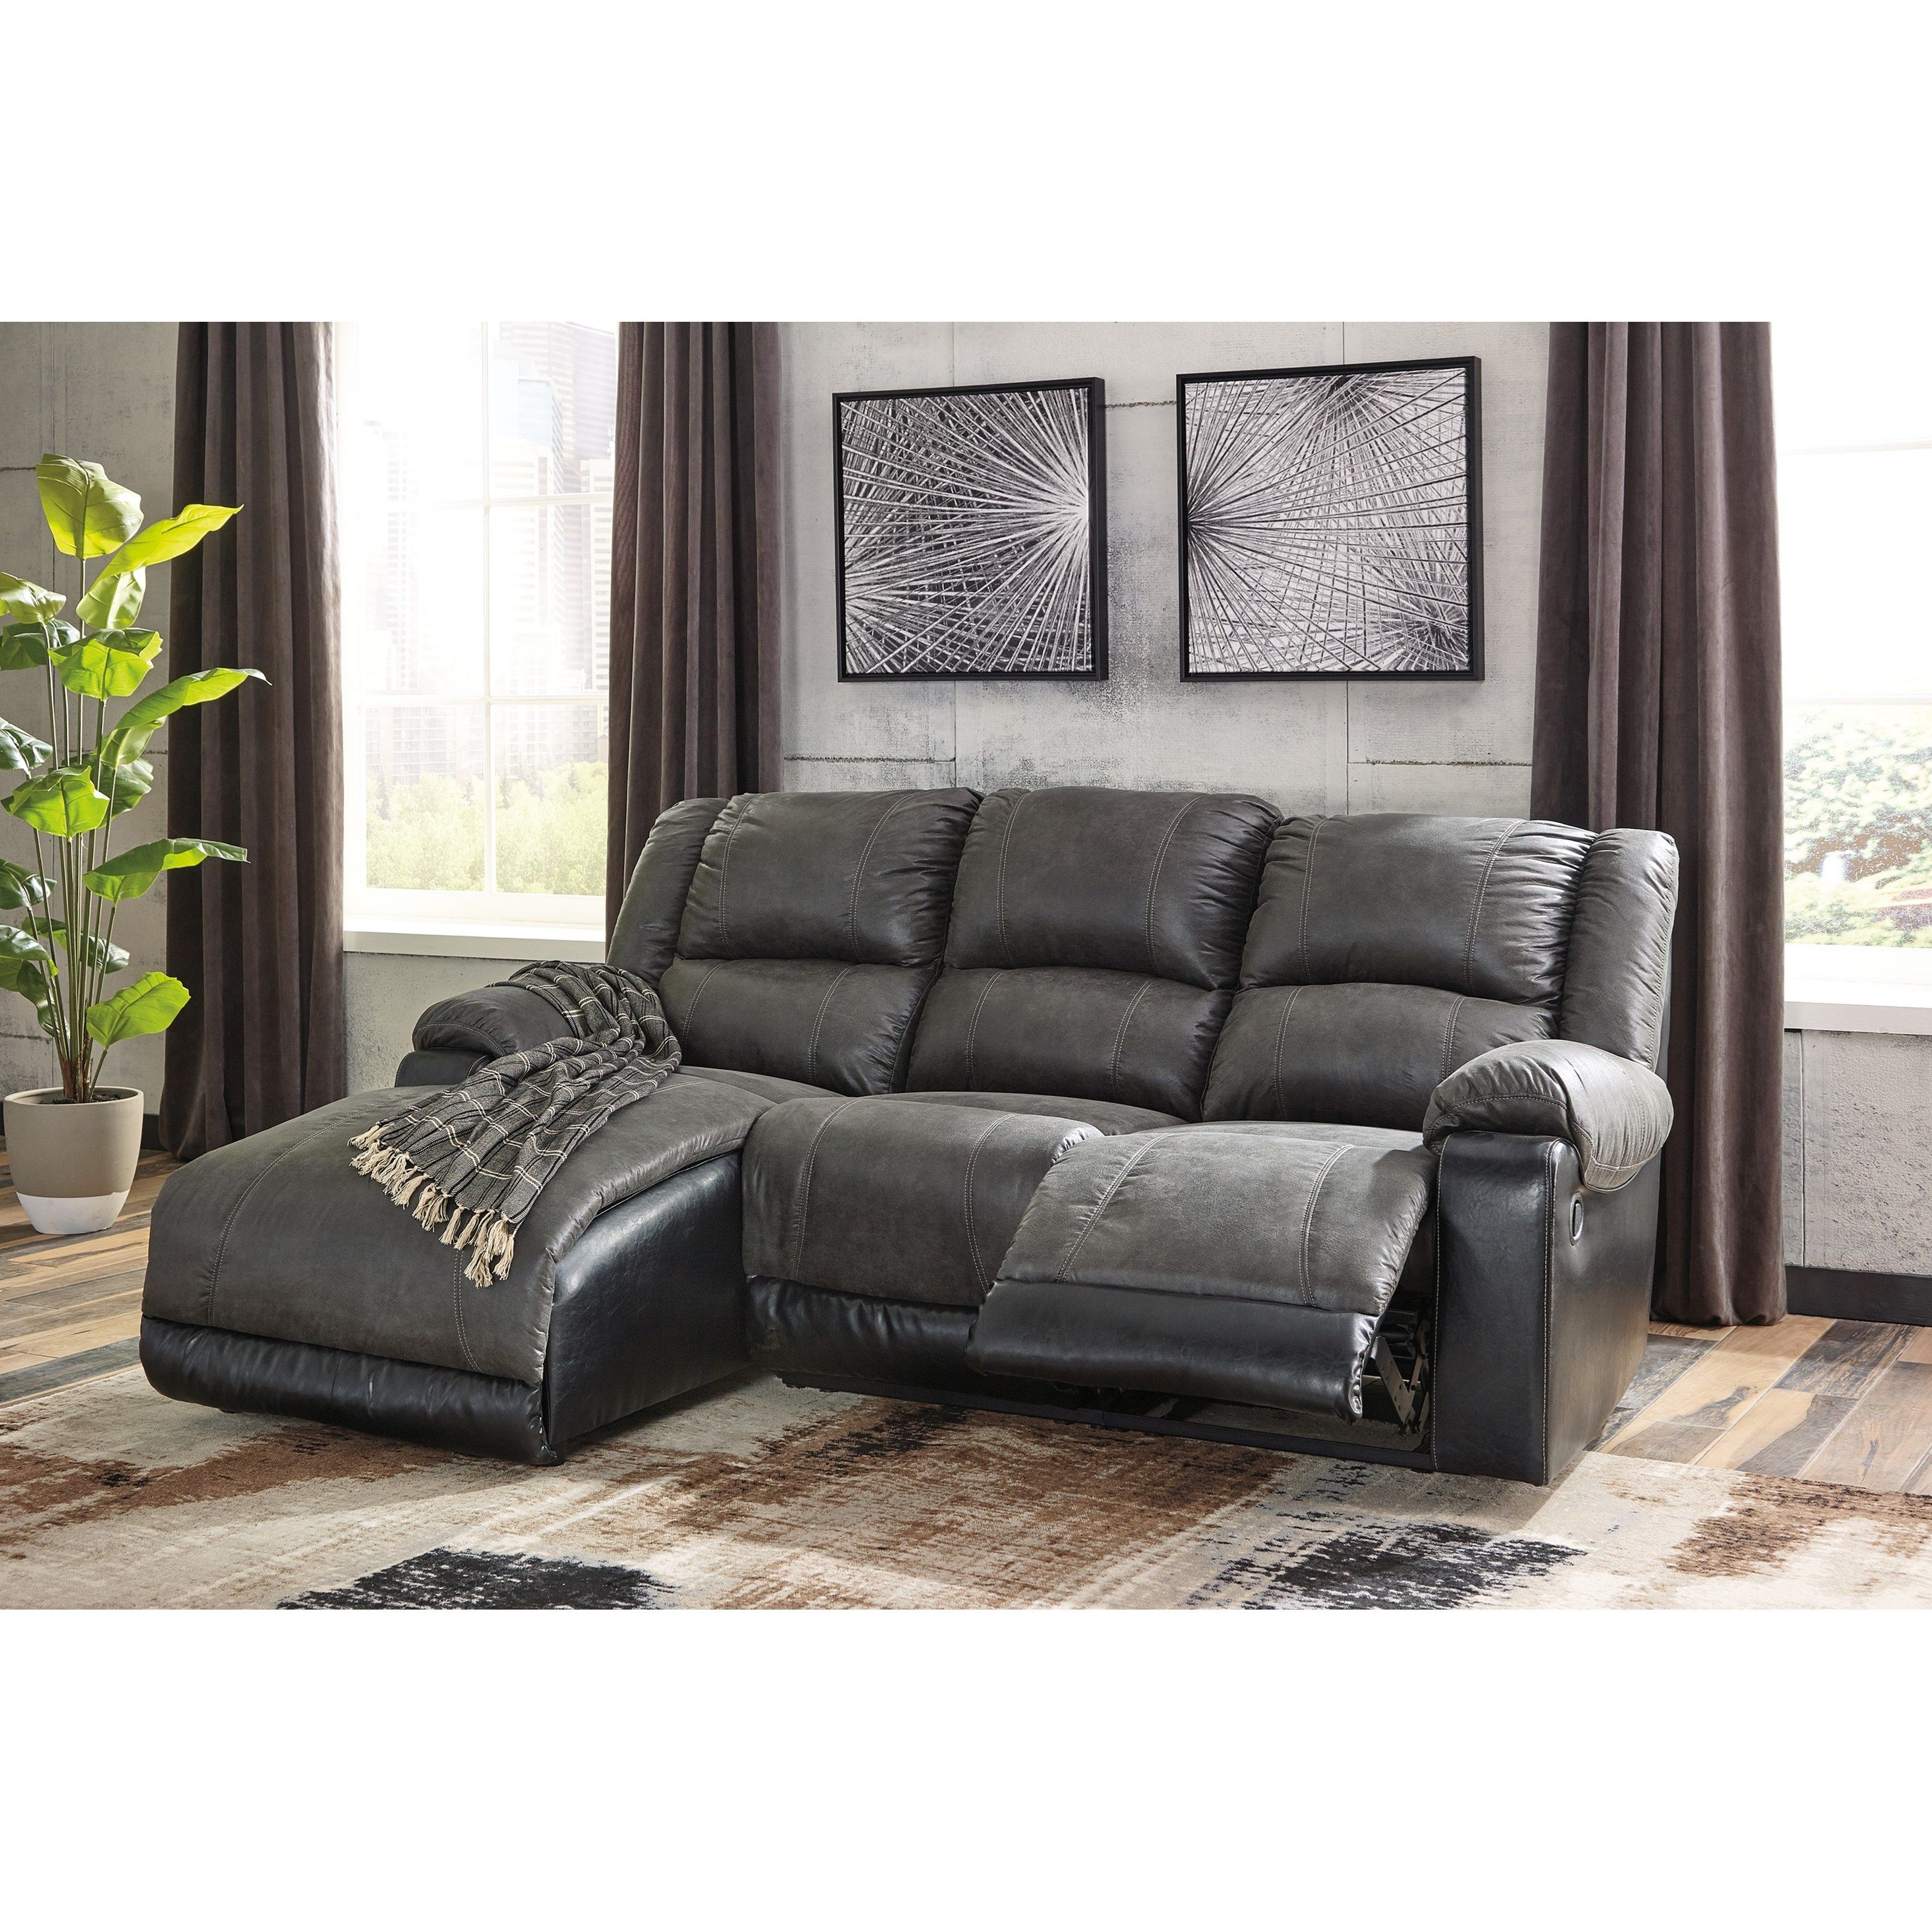 Signature Design By Ashley Nantahala Reclining Sofa With